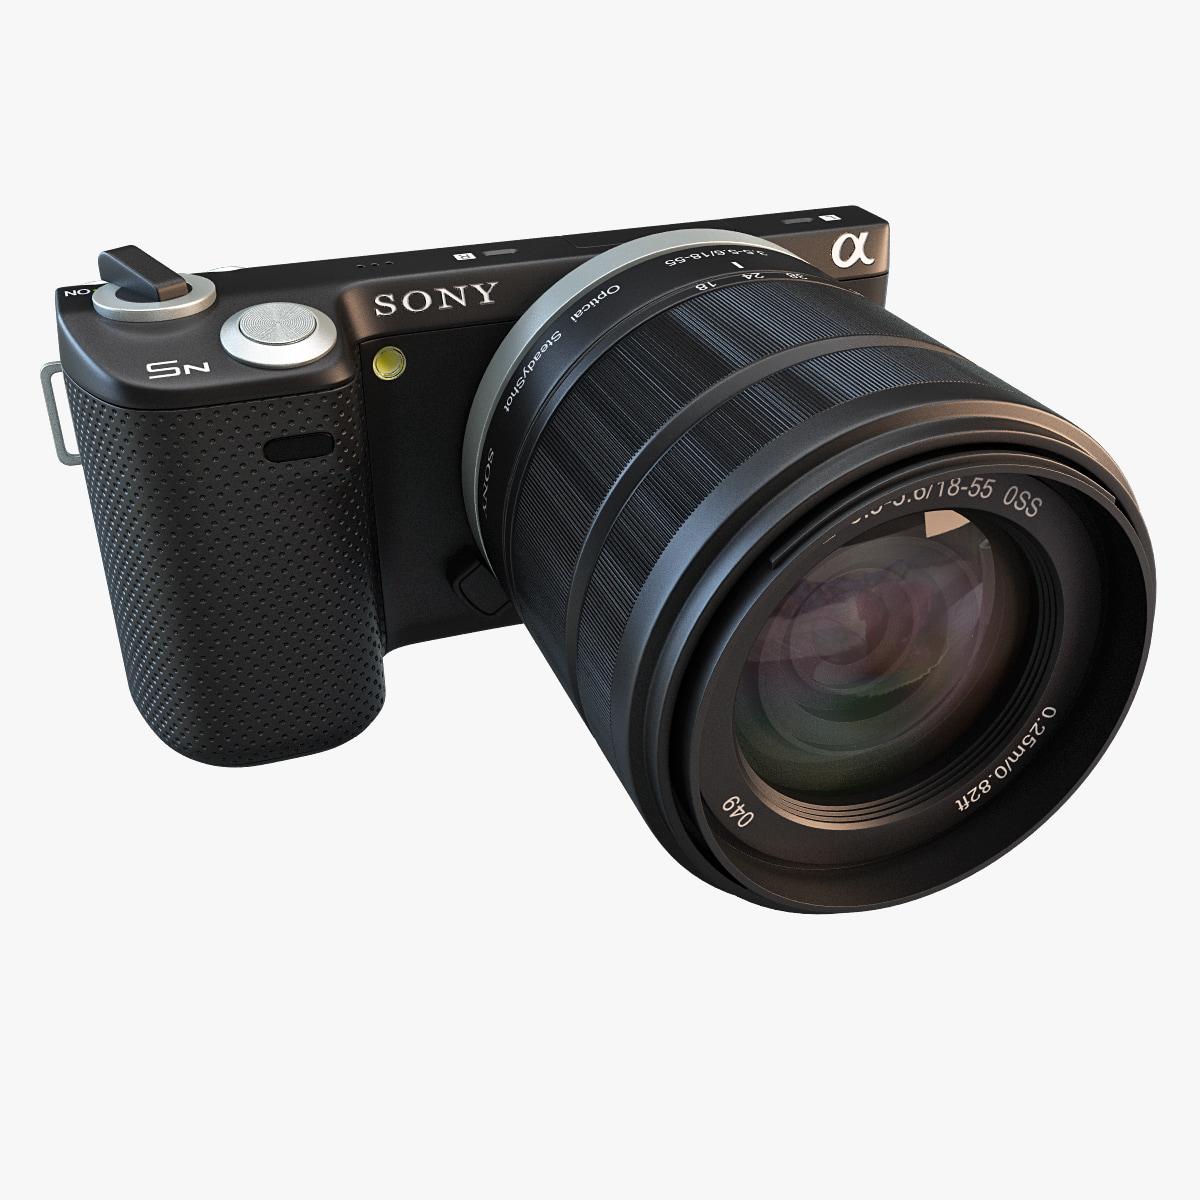 Sony NEX 5N Touchscreen Camera_1.jpg